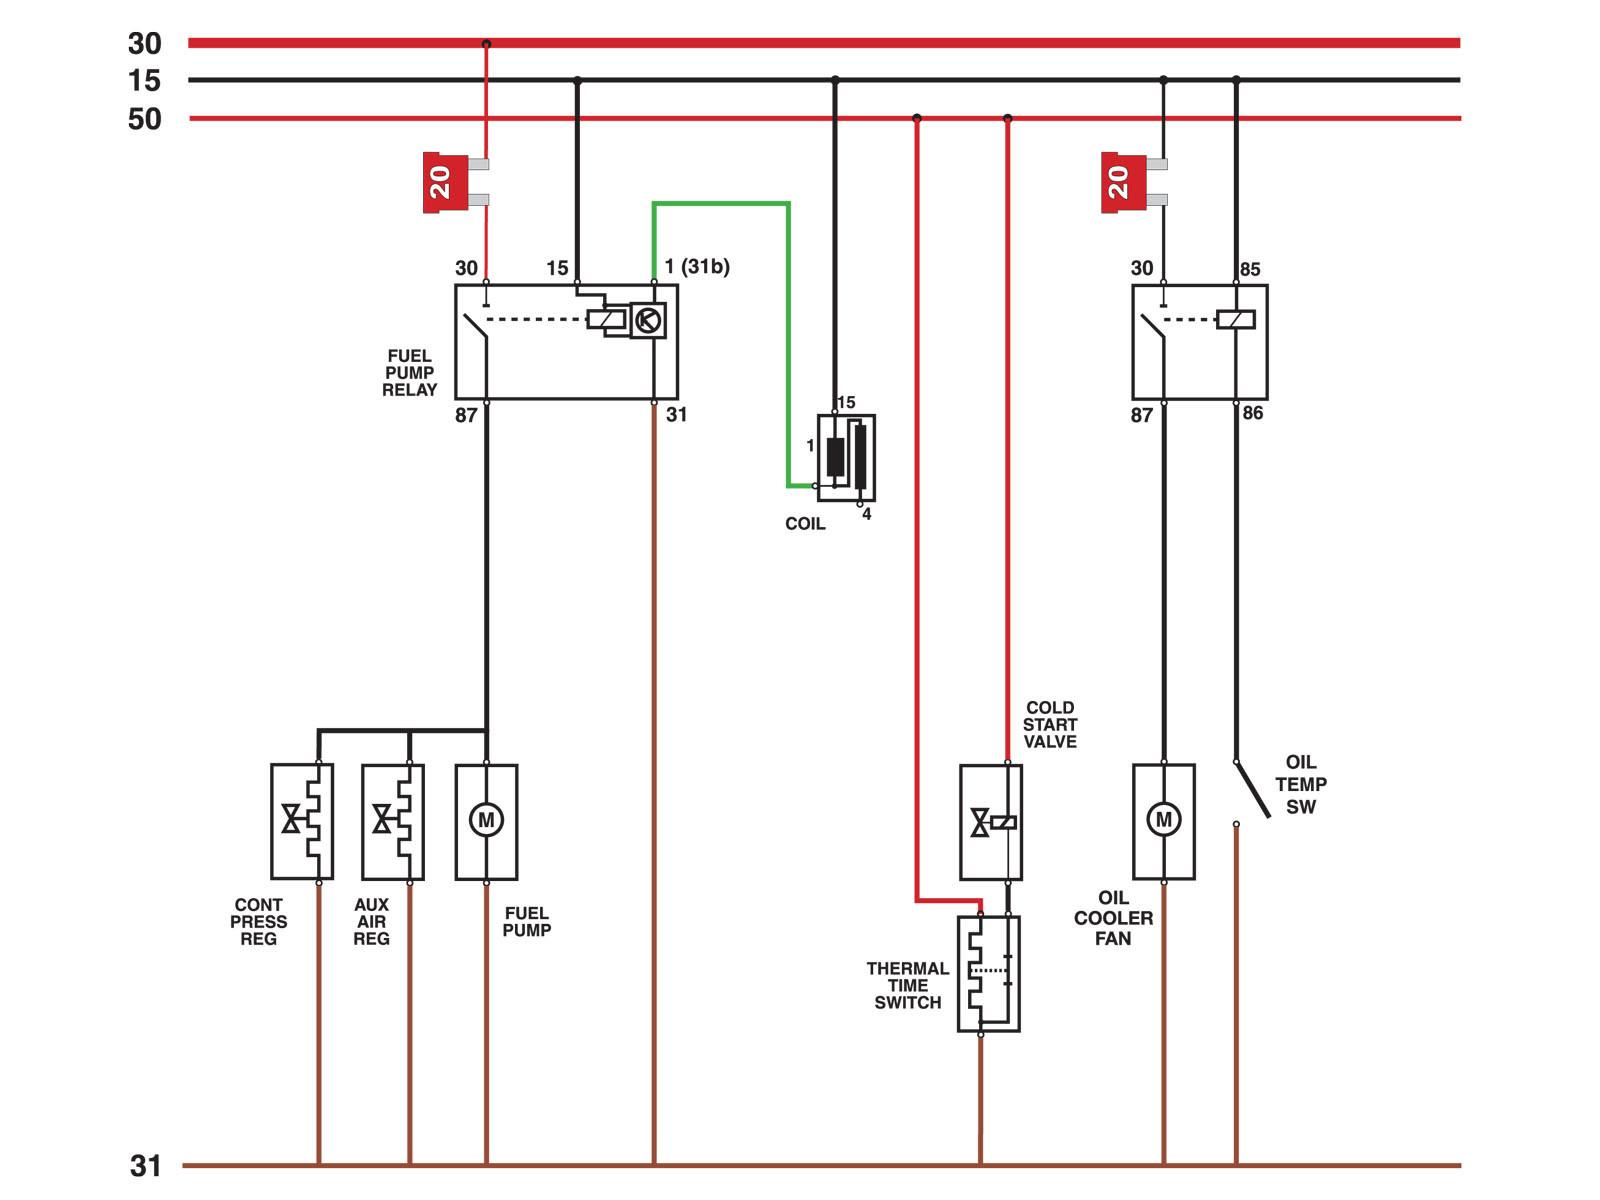 2008 Ford Escape Fuel Pump Relay Location Beautiful Electric Fuel - Electric Fuel Pump Wiring Diagram